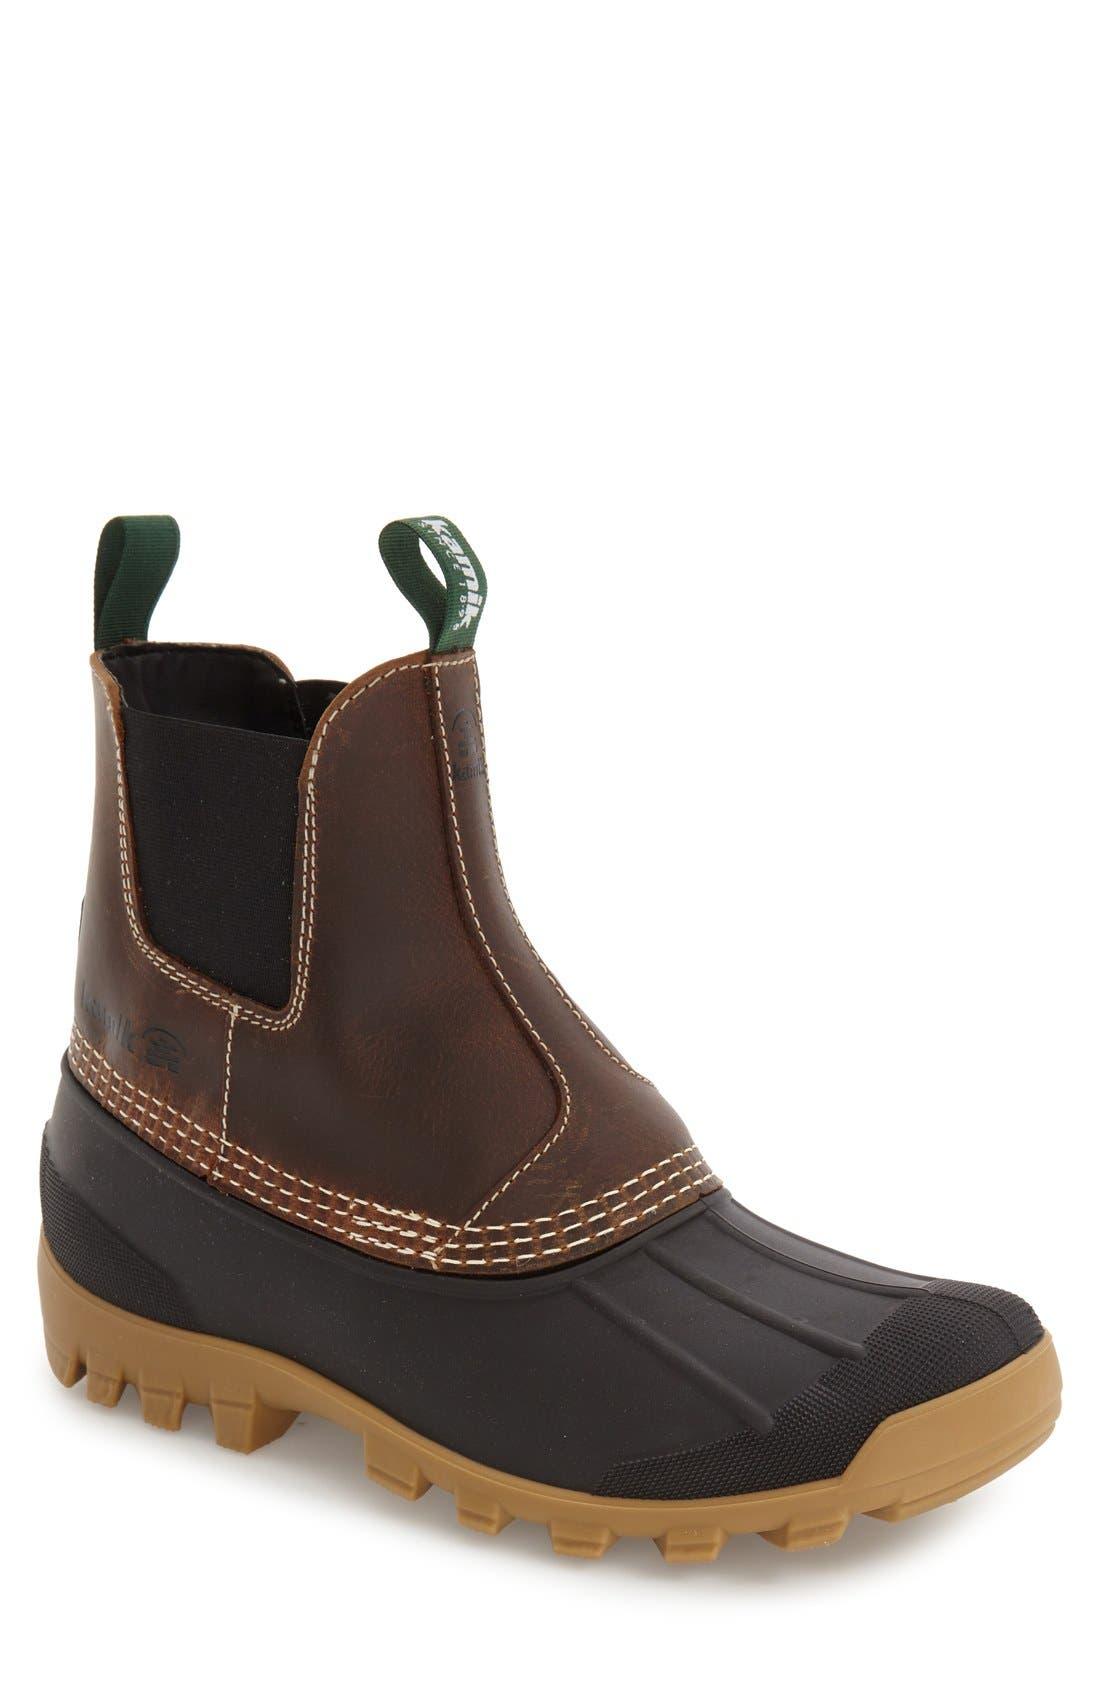 Yukon C Snow Waterproof Boot,                         Main,                         color, DARK BROWN LEATHER